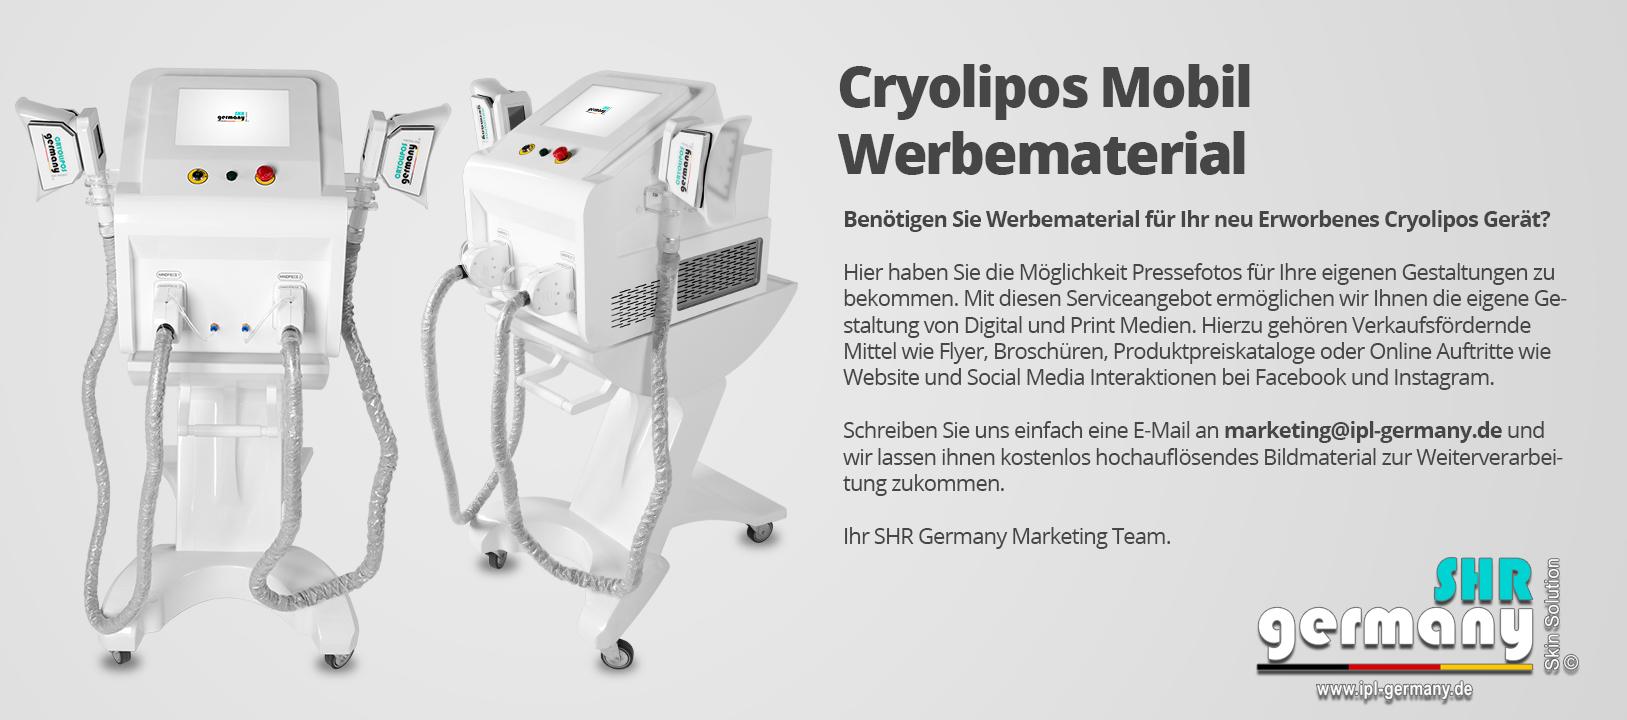 SHR-Germany_Cryolipos_Mobil_Werbematerial